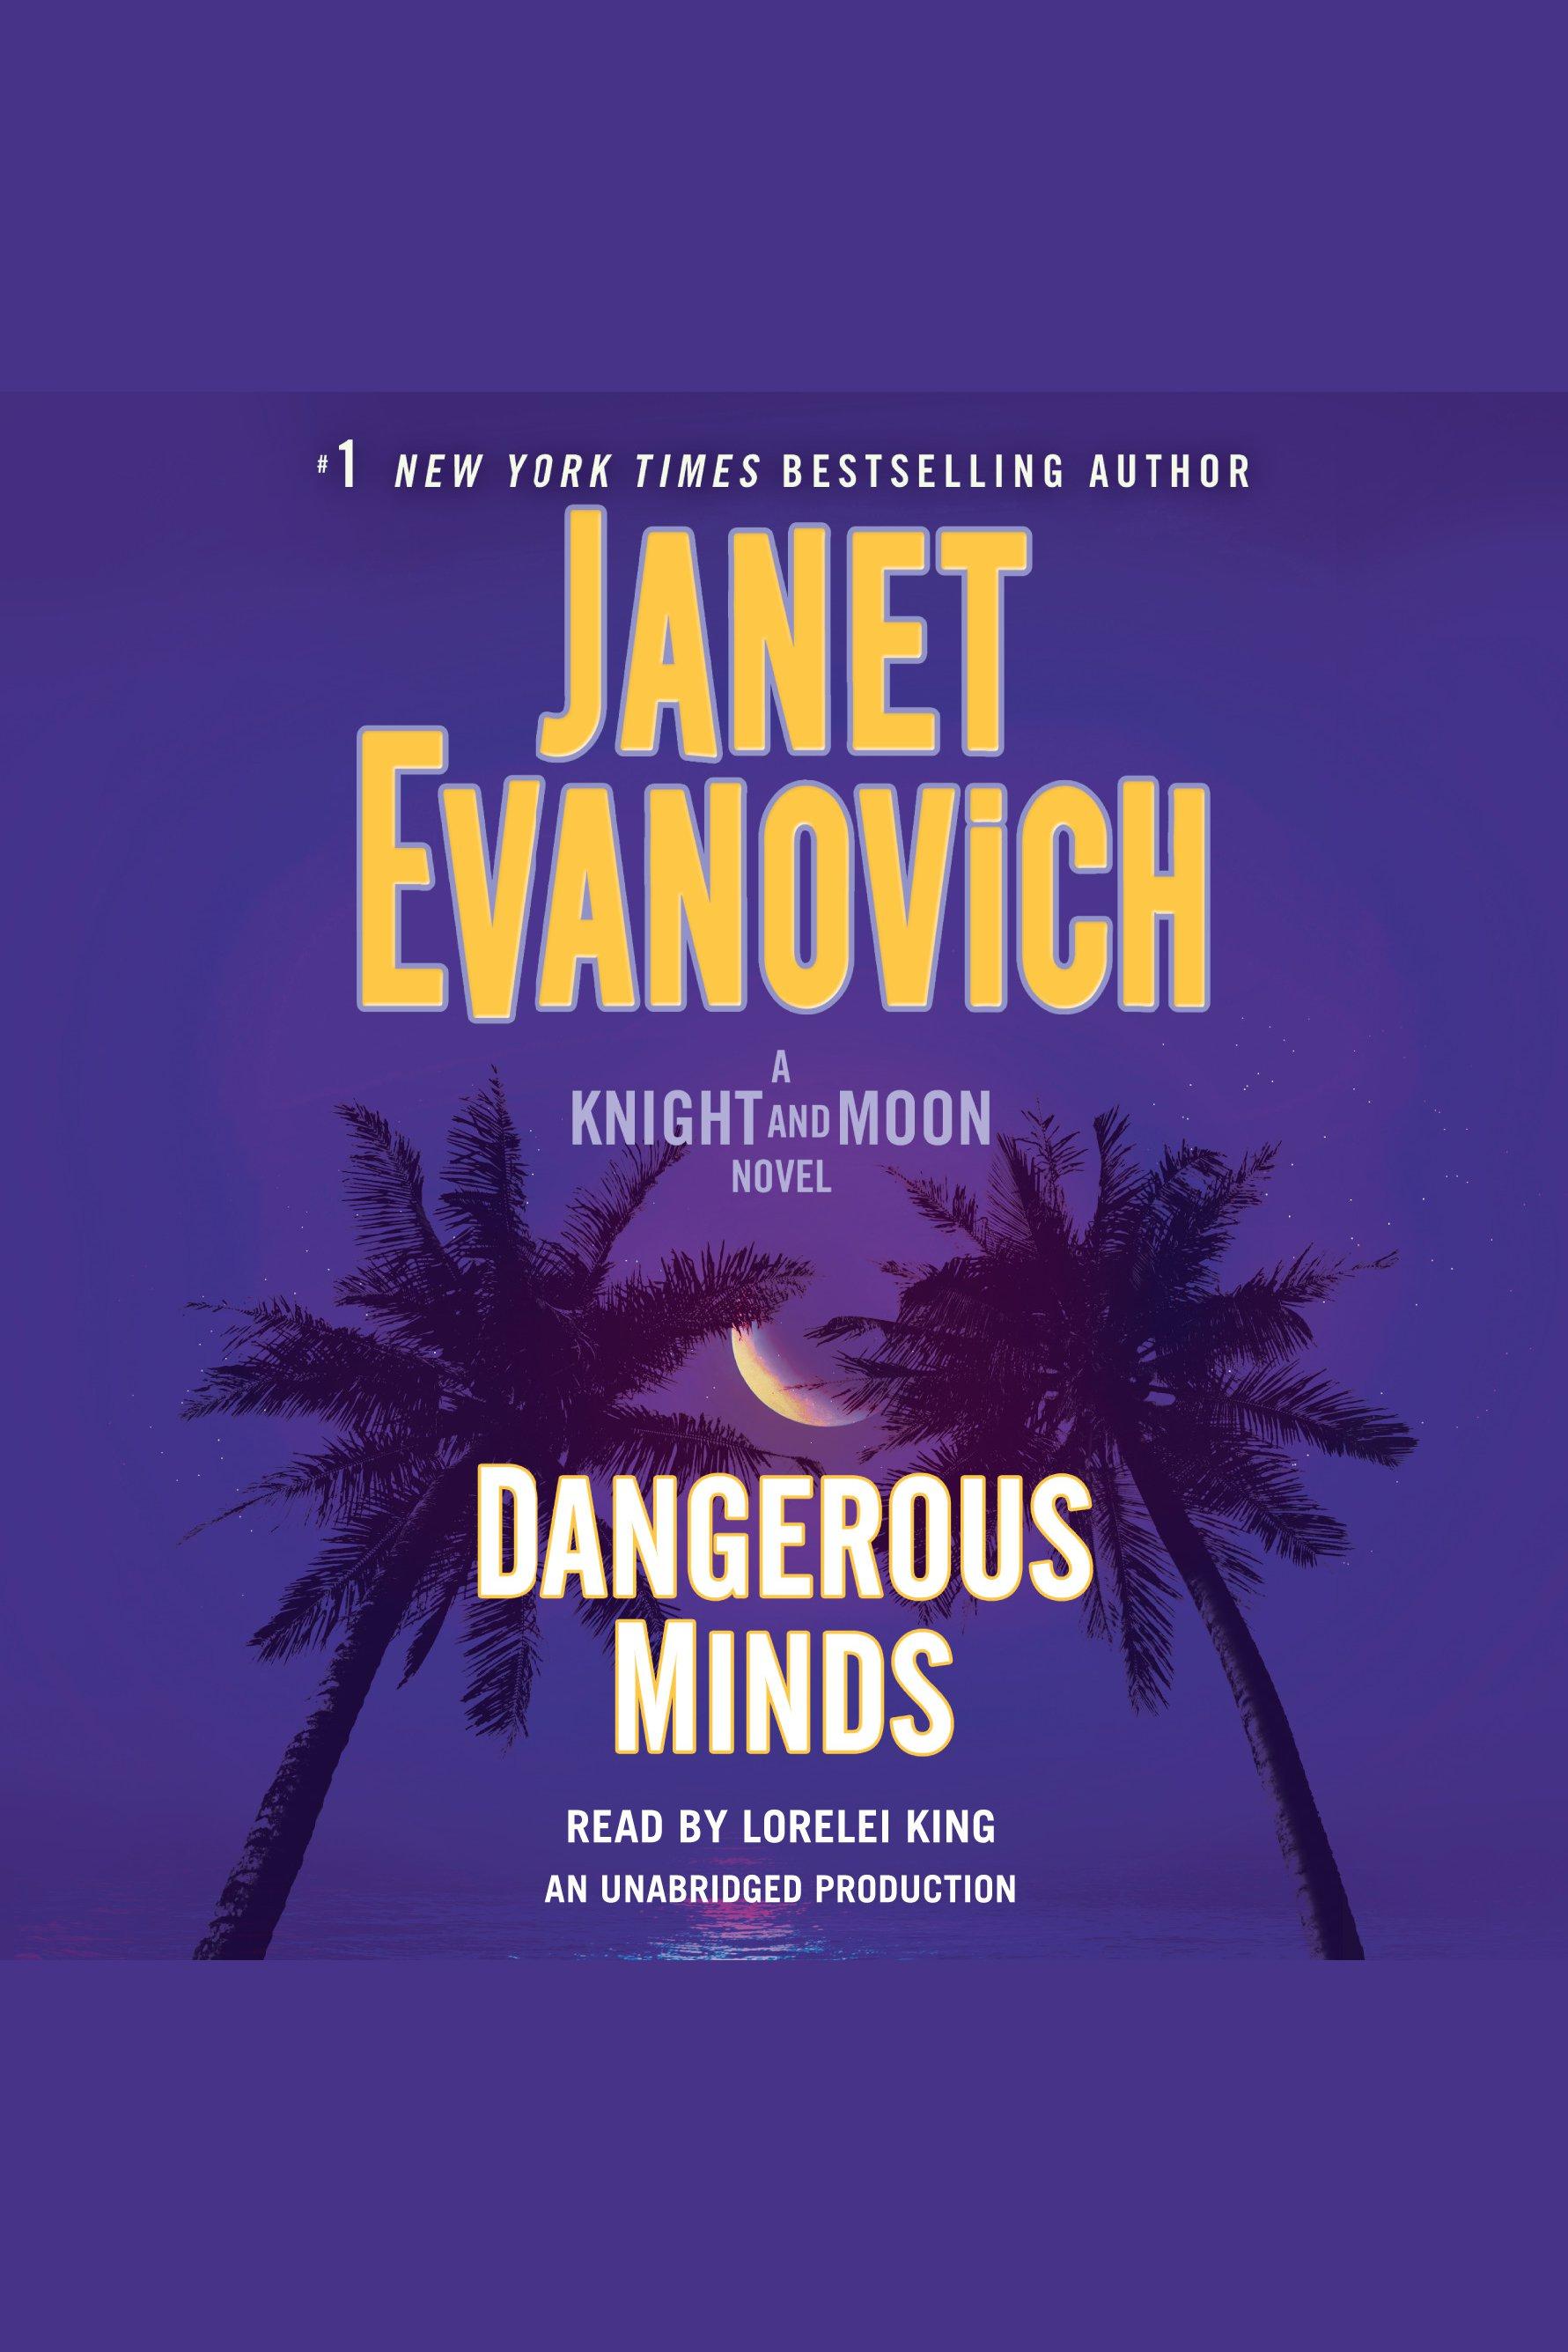 Dangerous Minds [AUDIO EBOOK] A Knight and Moon Novel